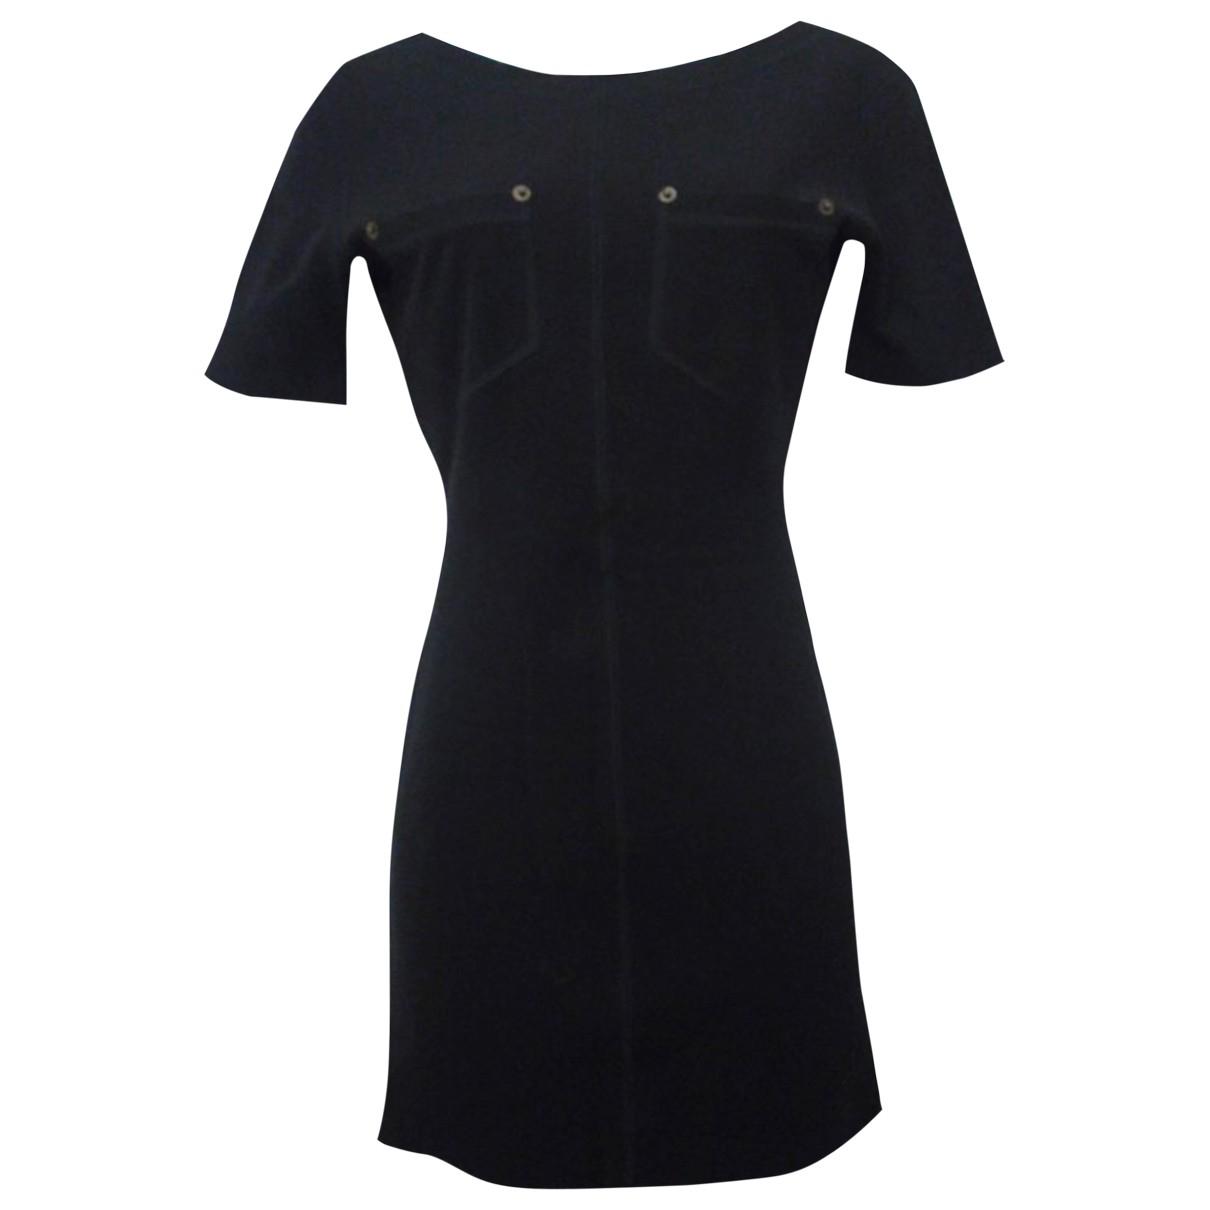 Plein Sud \N Black dress for Women S International